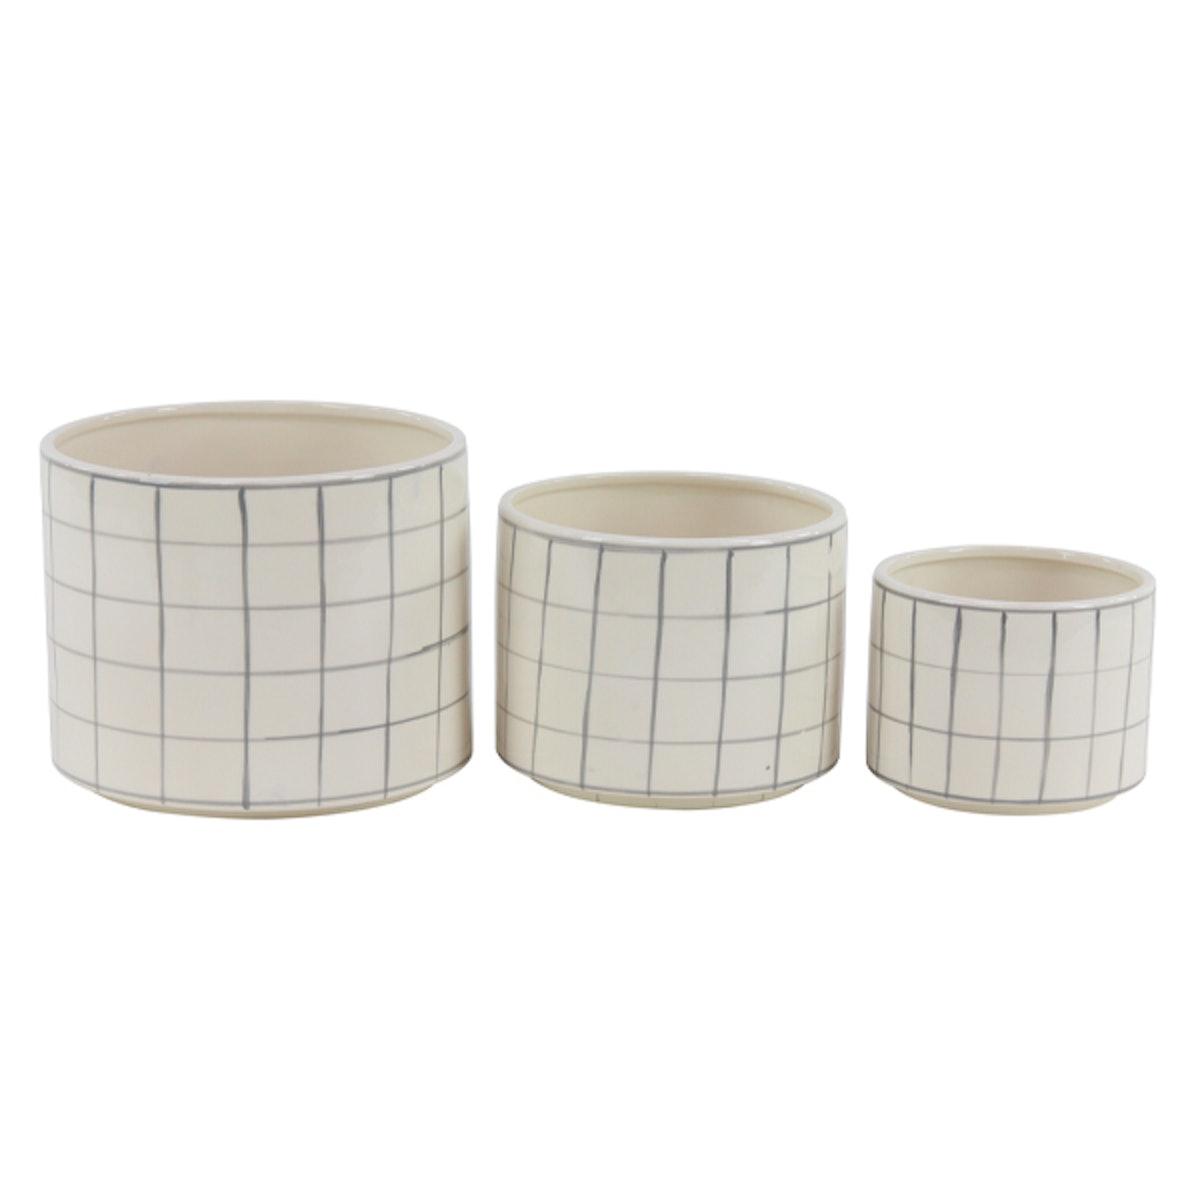 Cylindrical Ceramic Vases